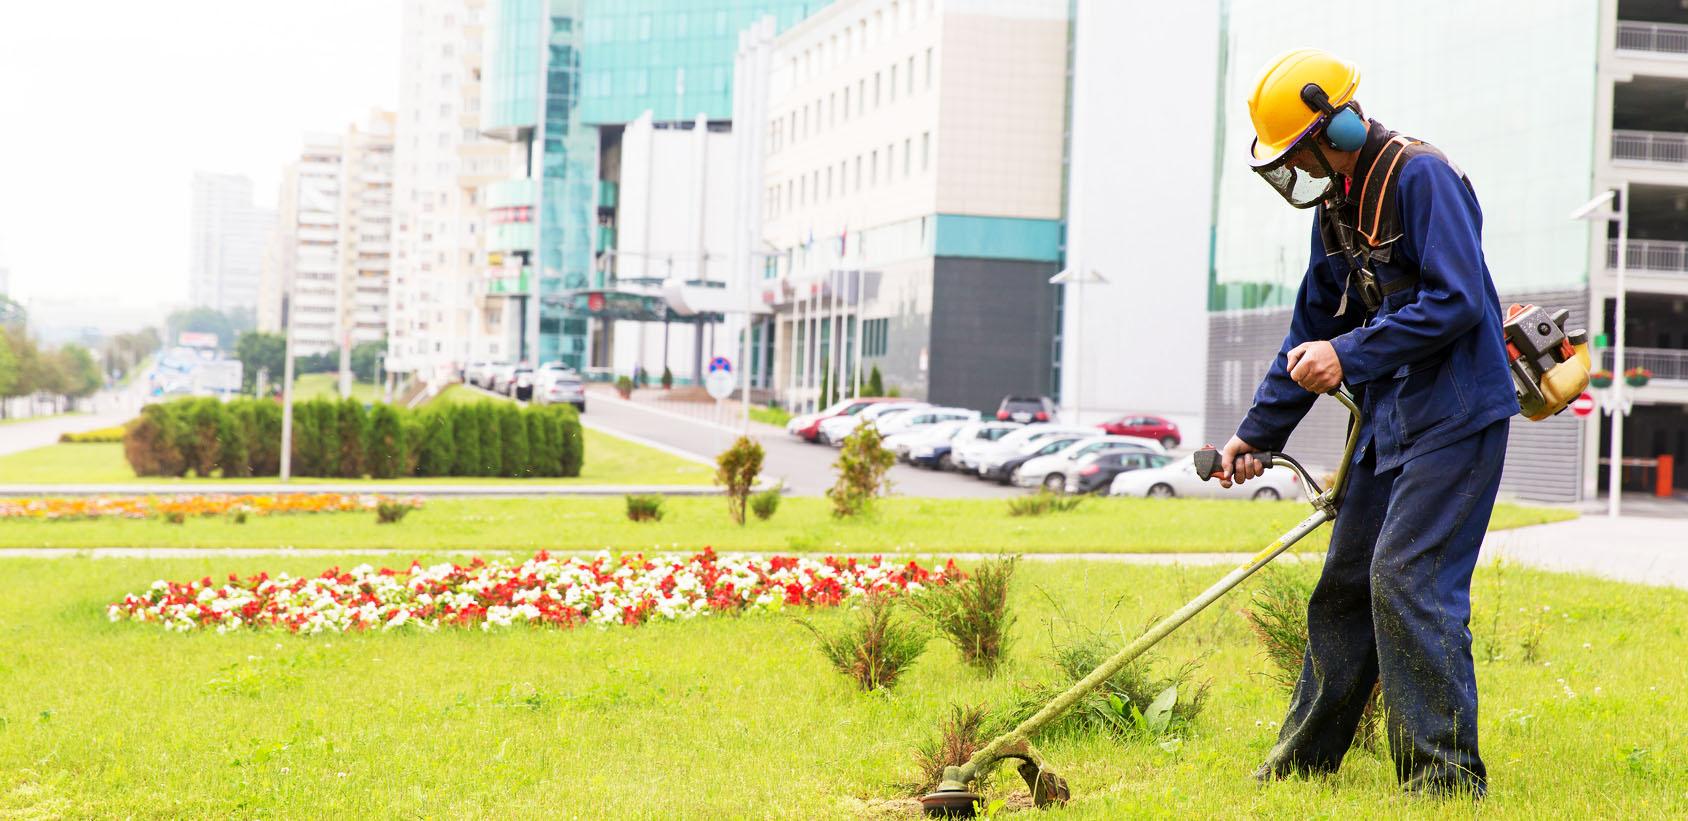 City landscaper mowing lawn wih gas trimmer